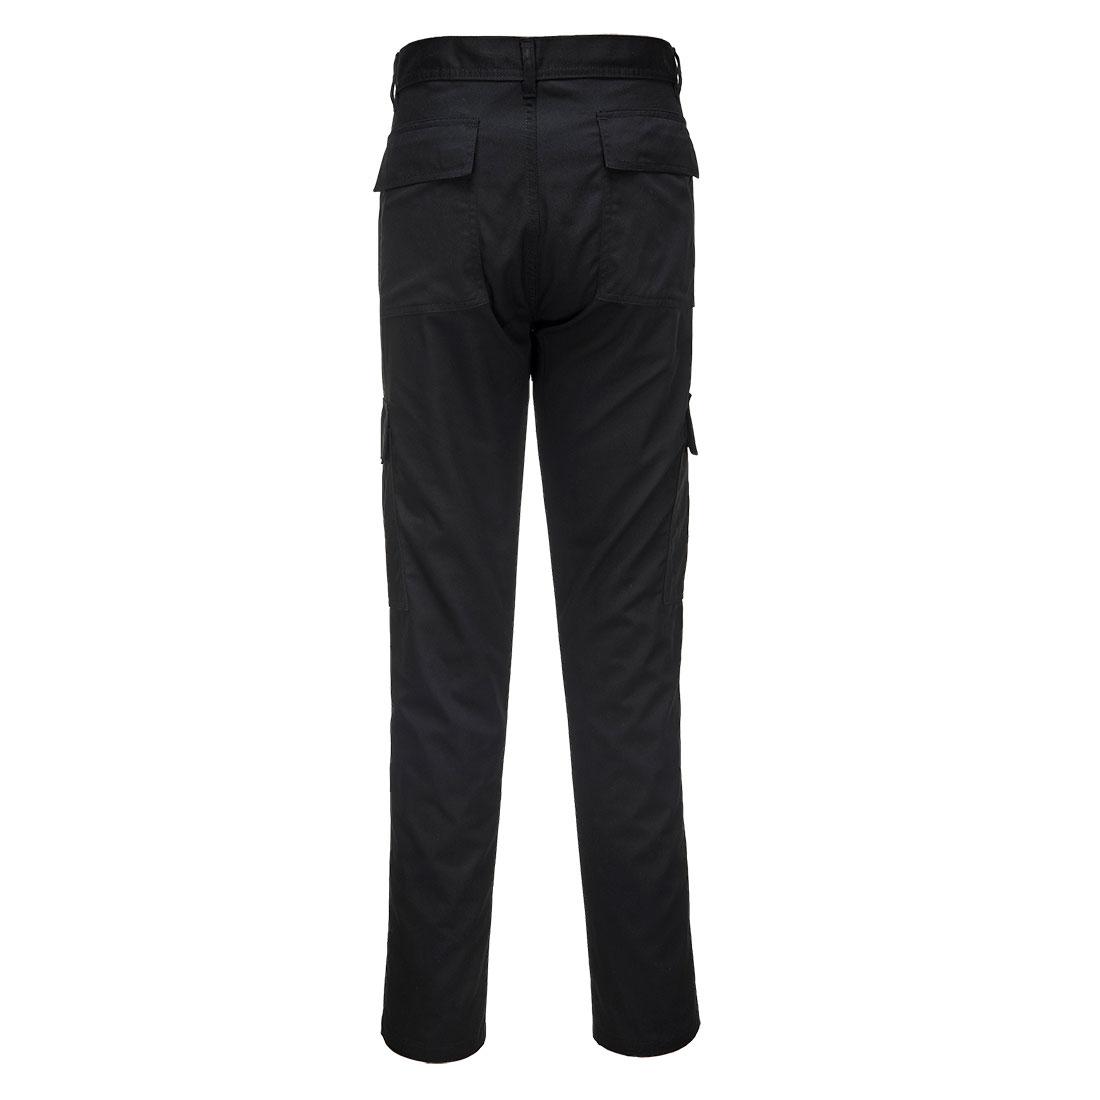 Slim Fit Combat Trousers Black 44R